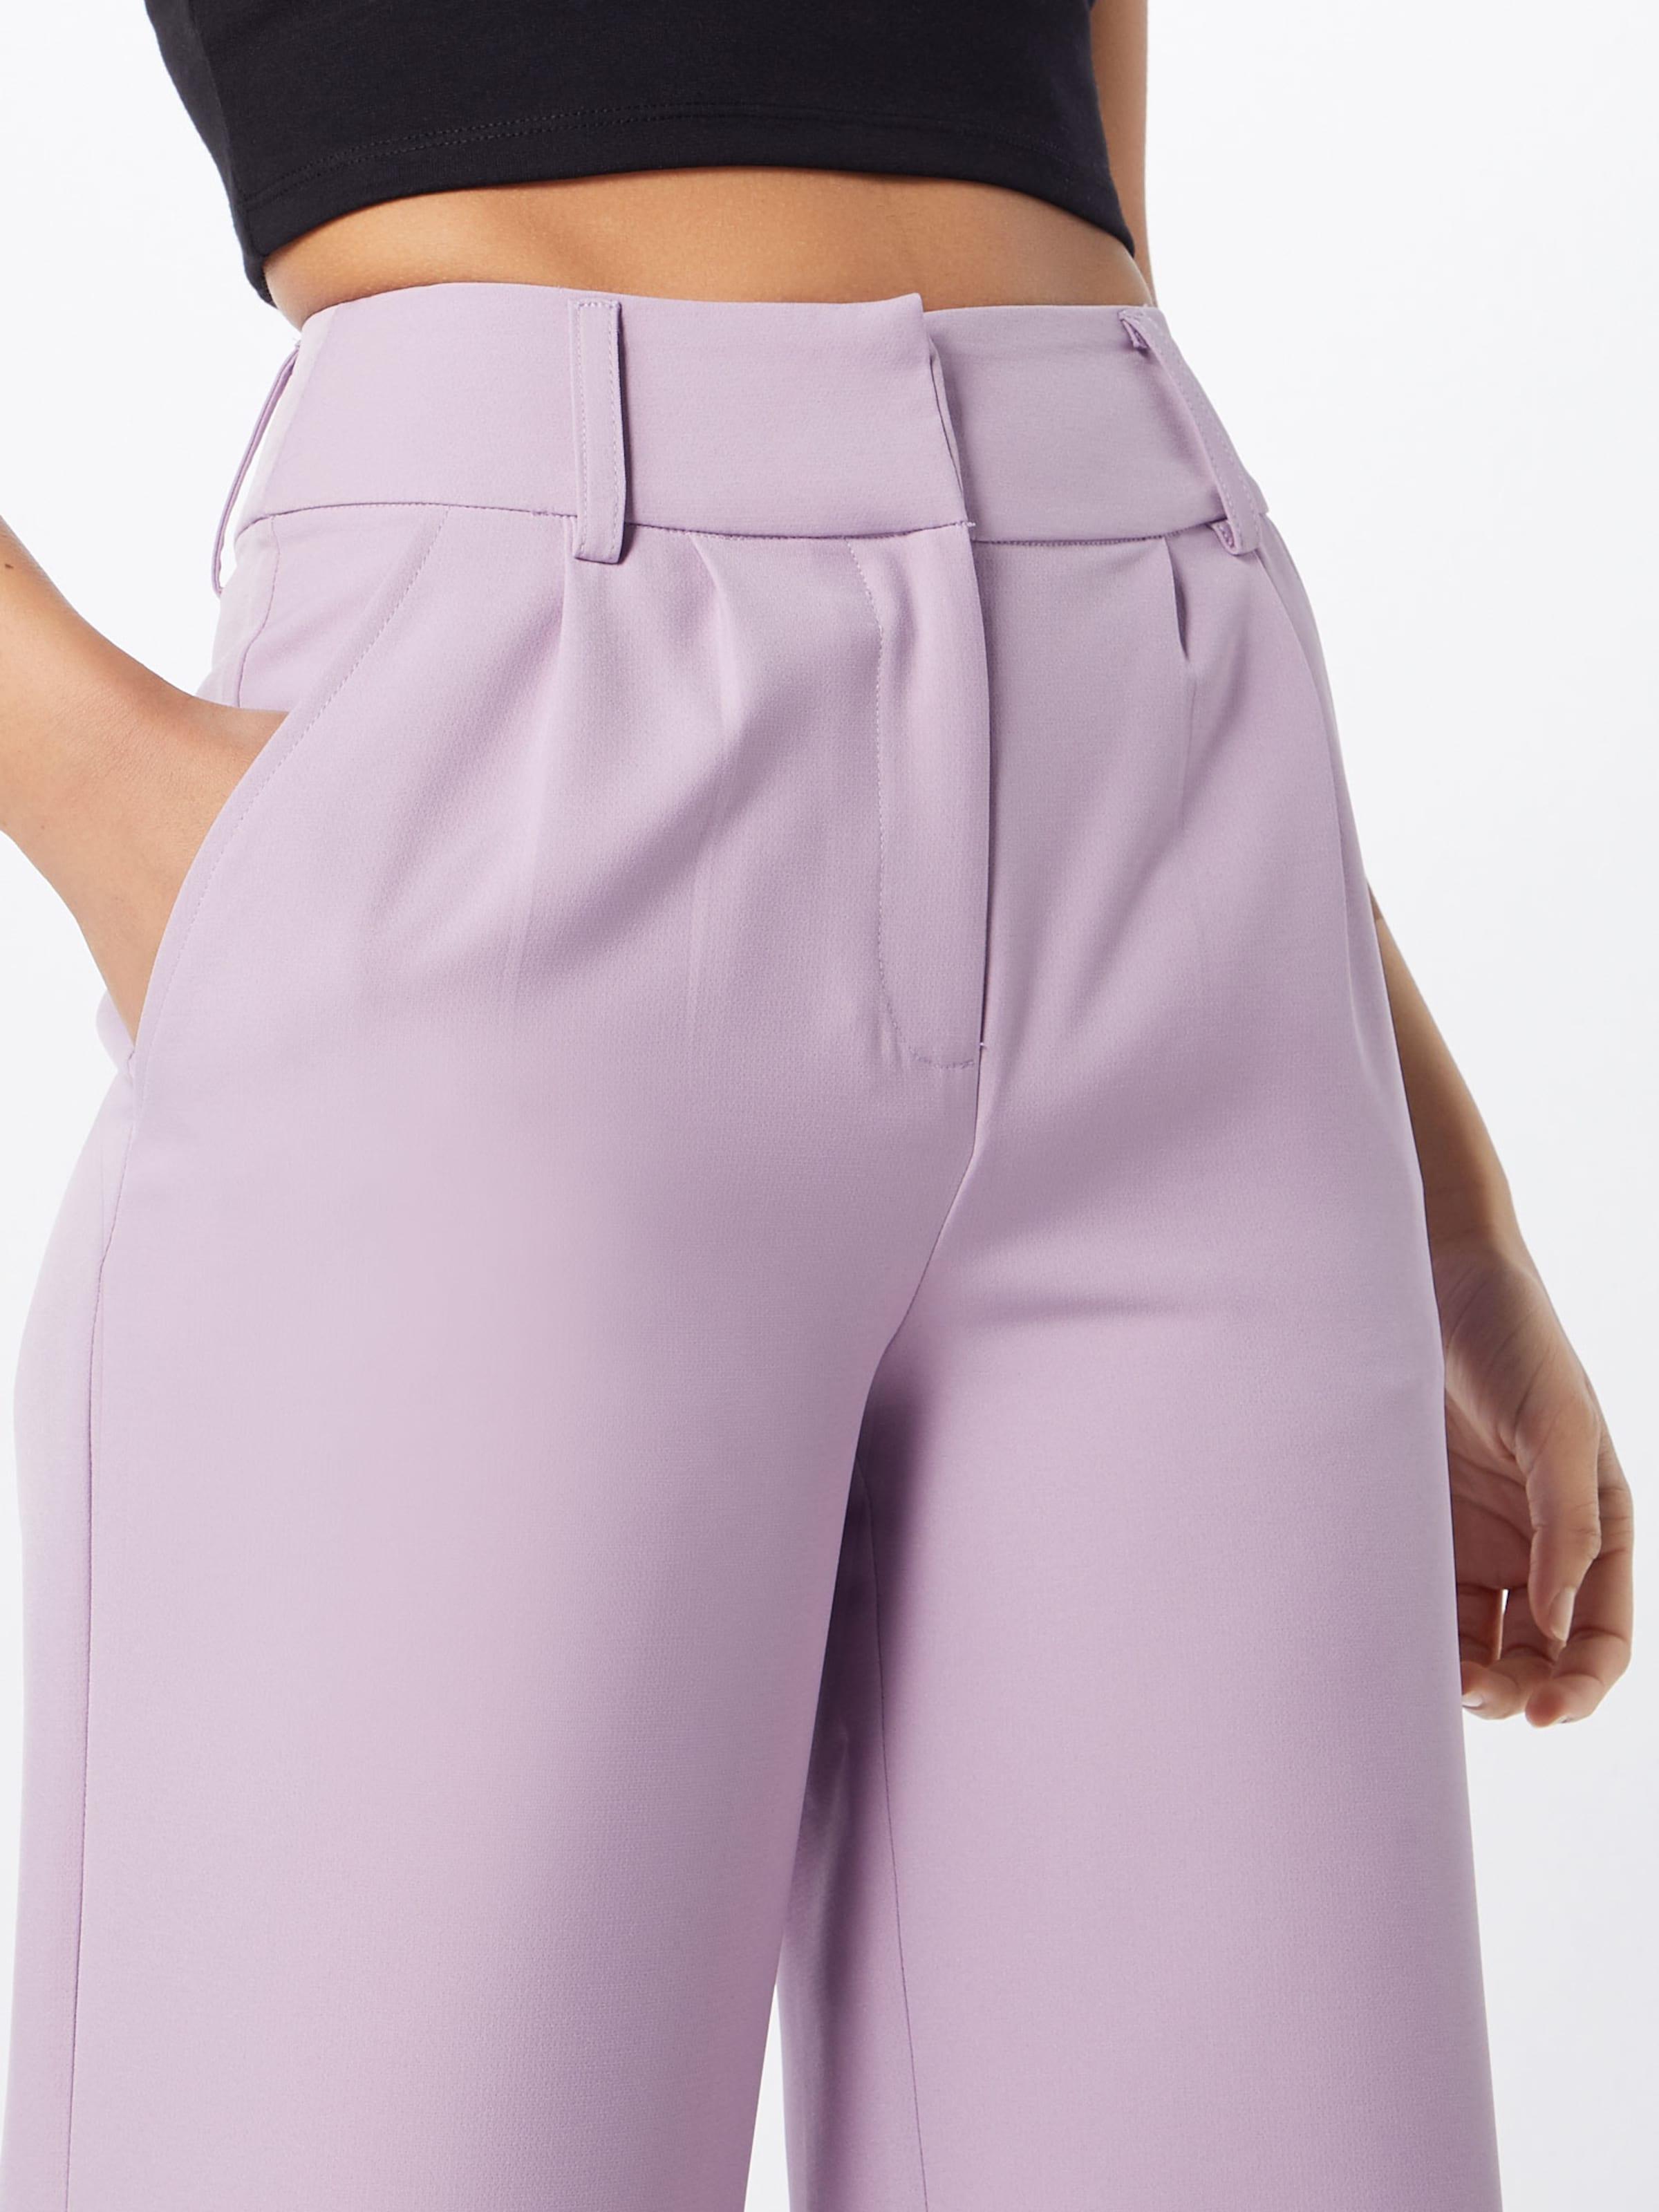 Pantalon En Reckless Trousers' 4thamp; 'true Violet KJcF13lT